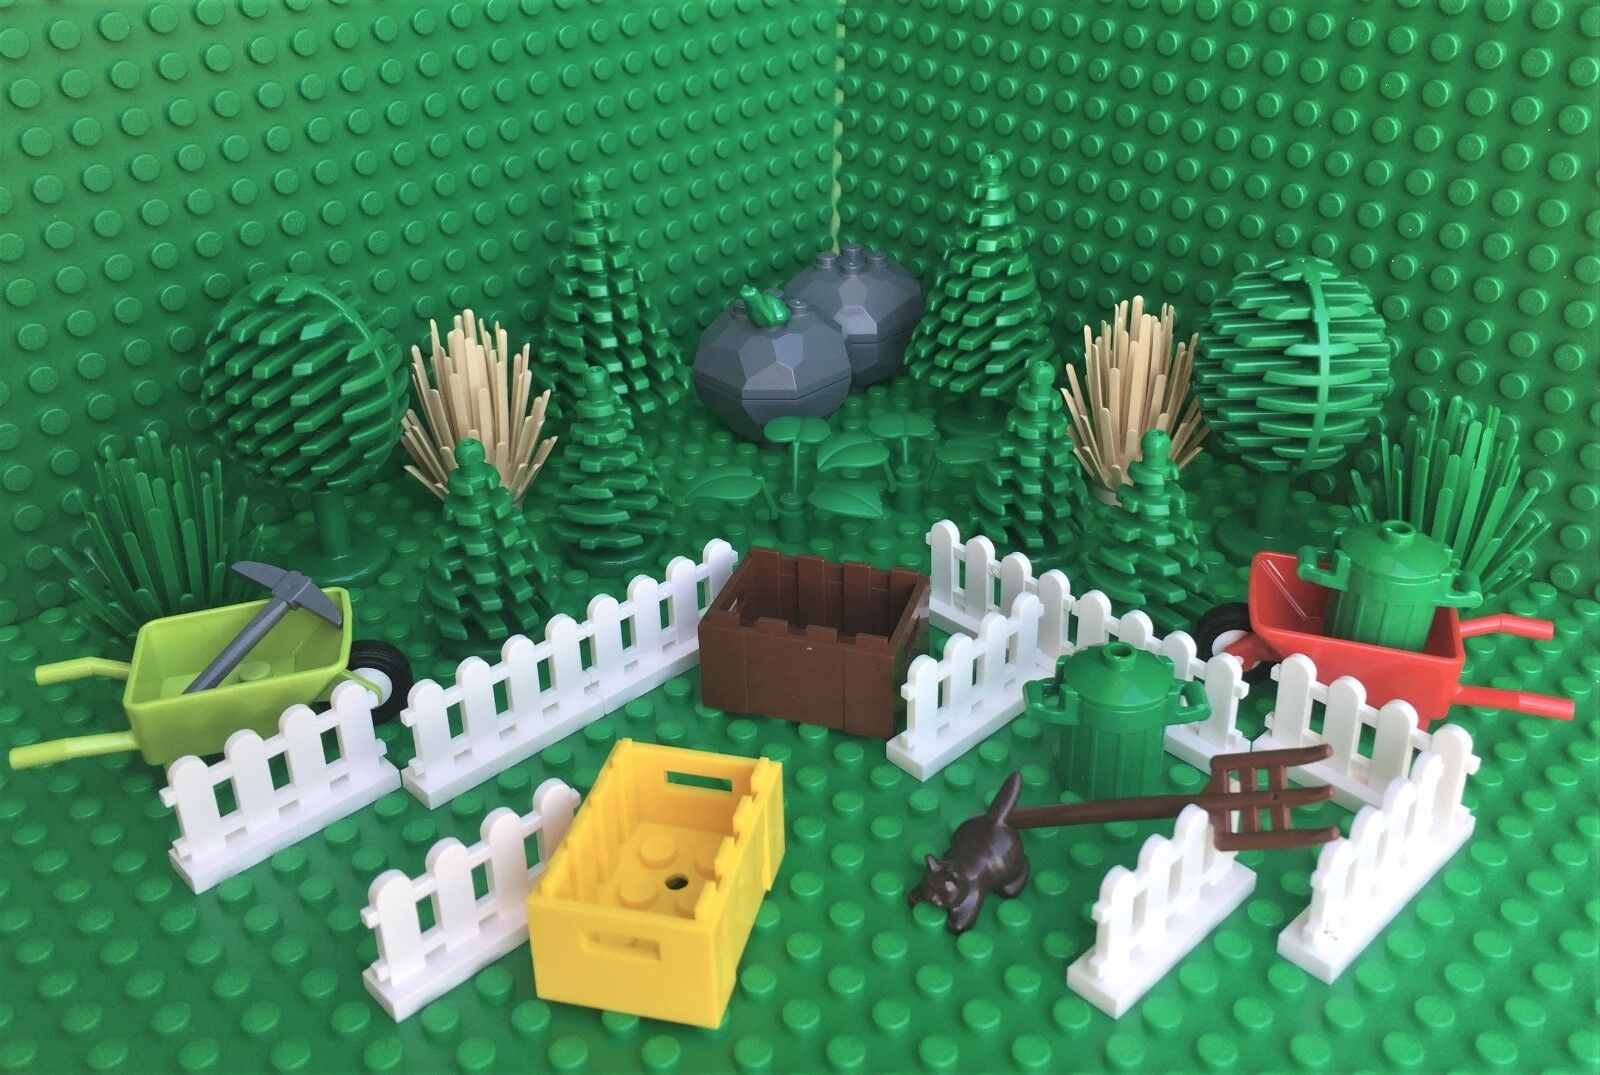 Lego Park Spares TREES Fances Crates hjul Barrow City Town Forest Harry krukmakare